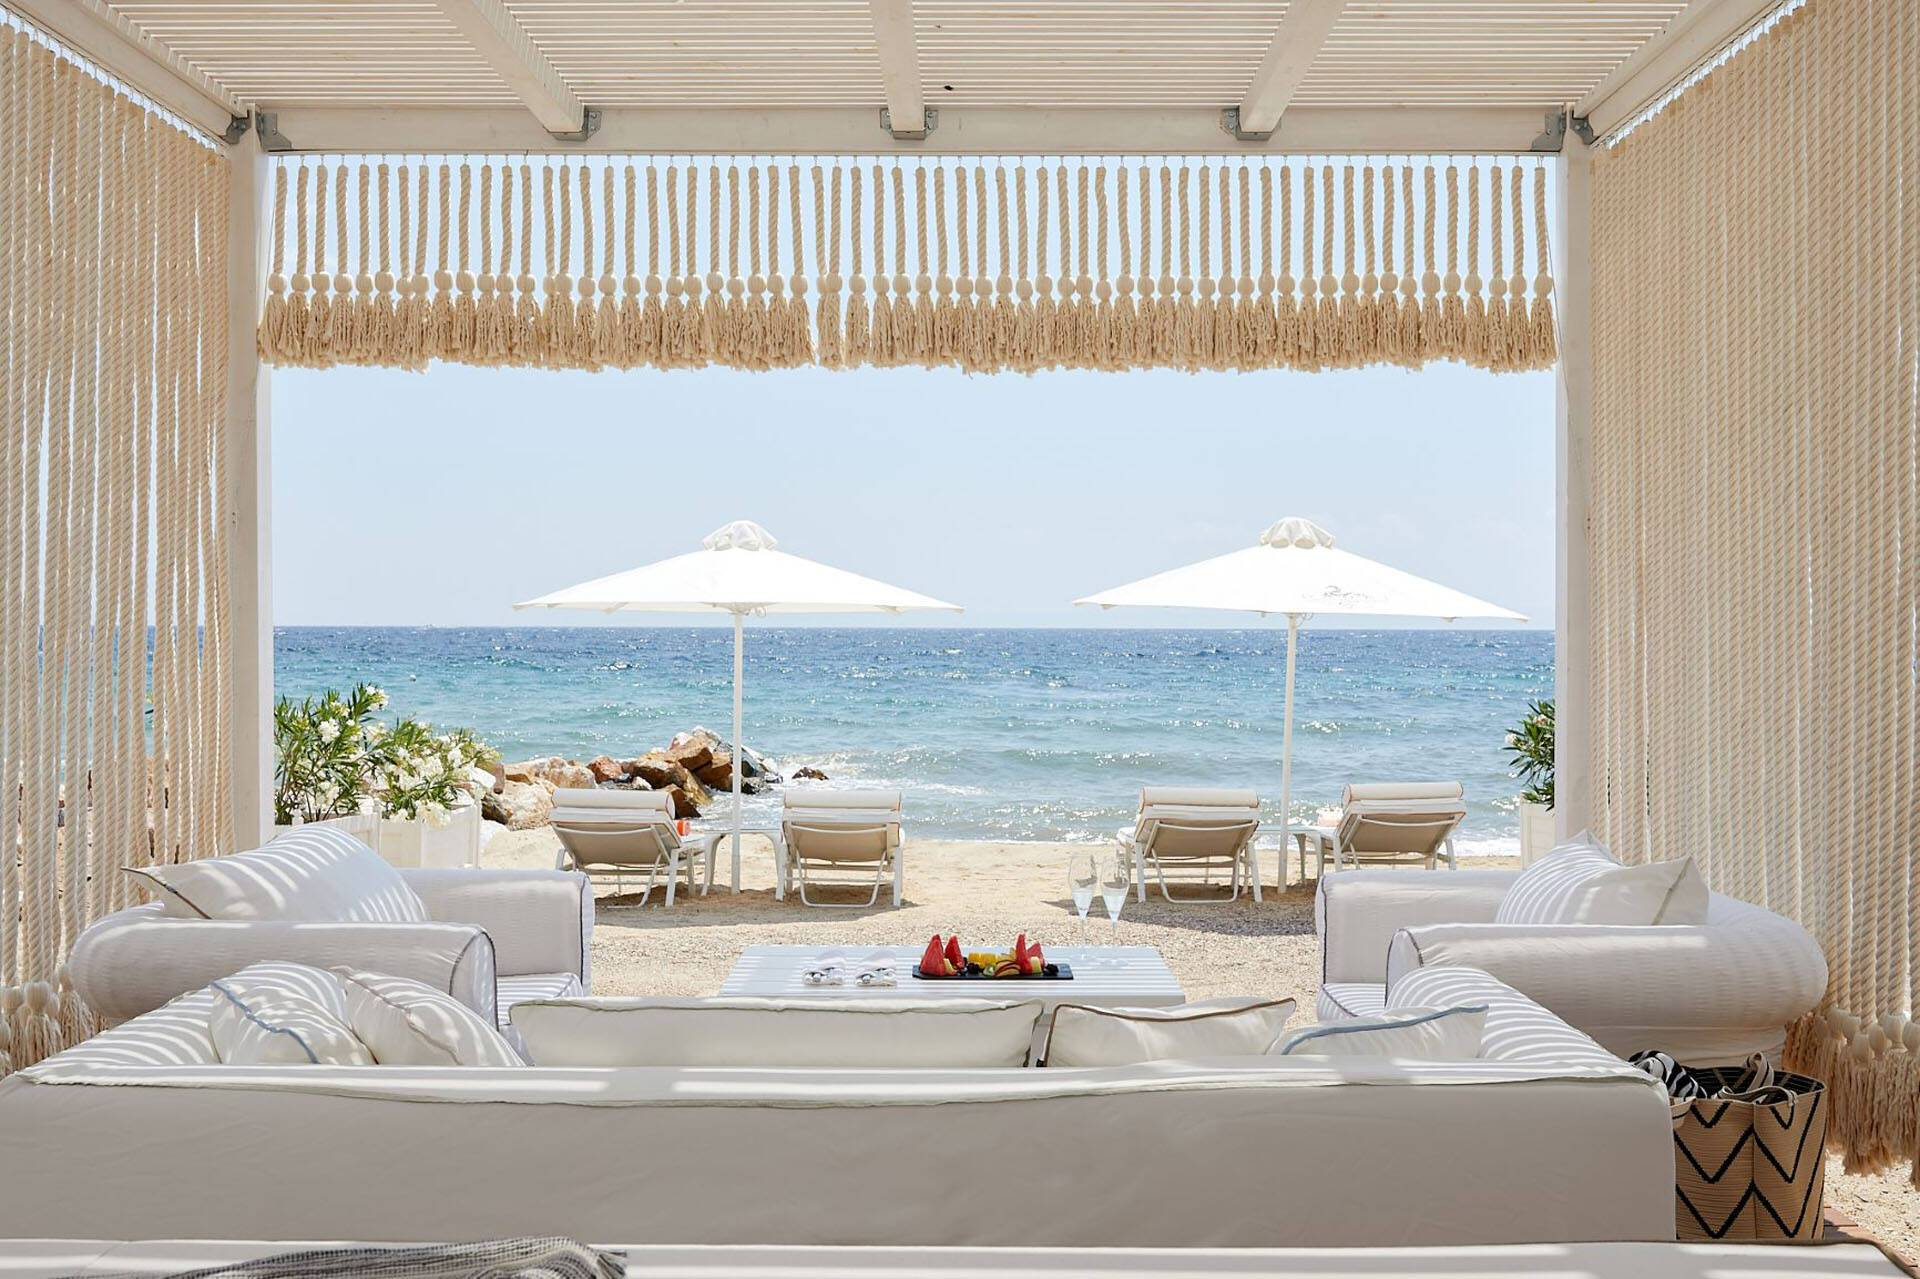 Danai Thessalonique Grece Beach Cabana